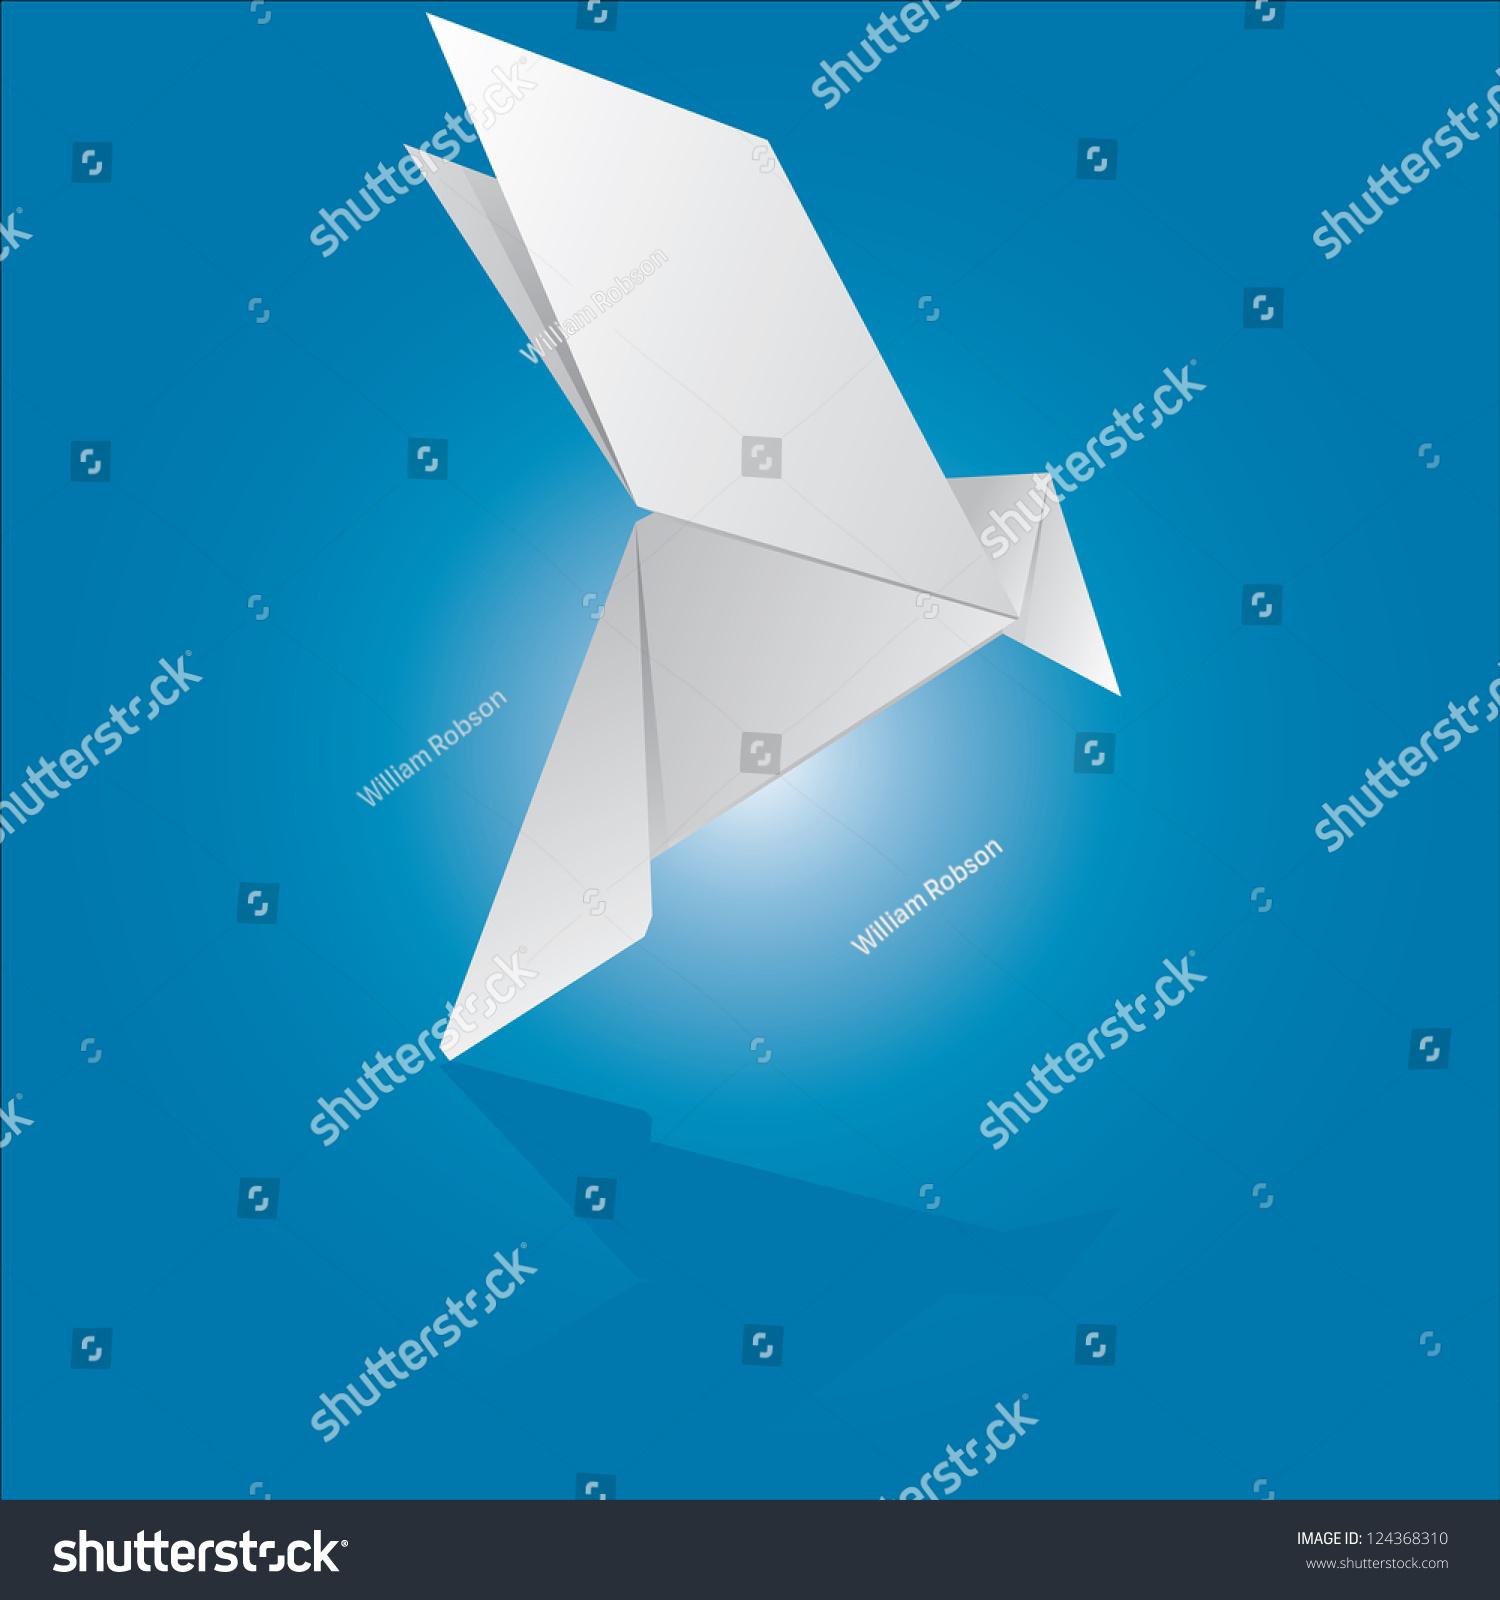 Origami Dove Vector Illustration - 124368310 : Shutterstock - photo#16